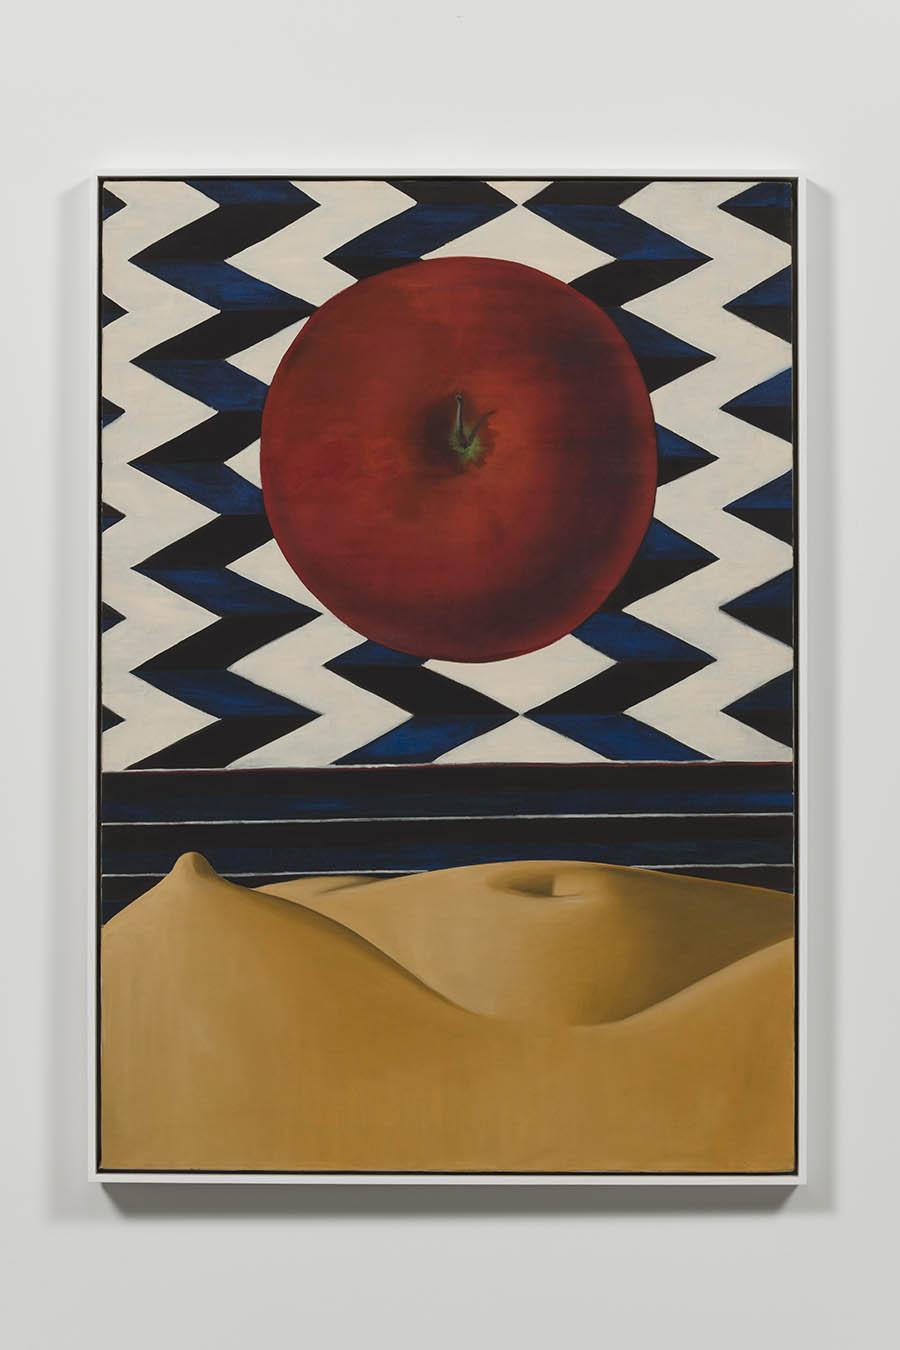 Luchita Hurtado, Untitled, 1971, Oil on canvas, Unique, 127 x 88.6 cm, © Luchita Hurtado, Courtesy the artist and Hauser & Wirth, Photo: Jeff McLane